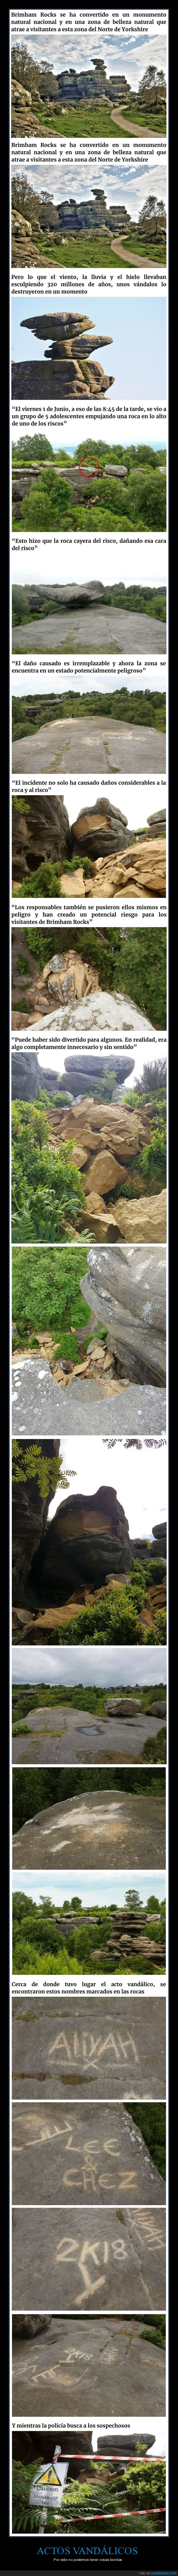 brimham rocks,monumento natural,rocas,vandalismo